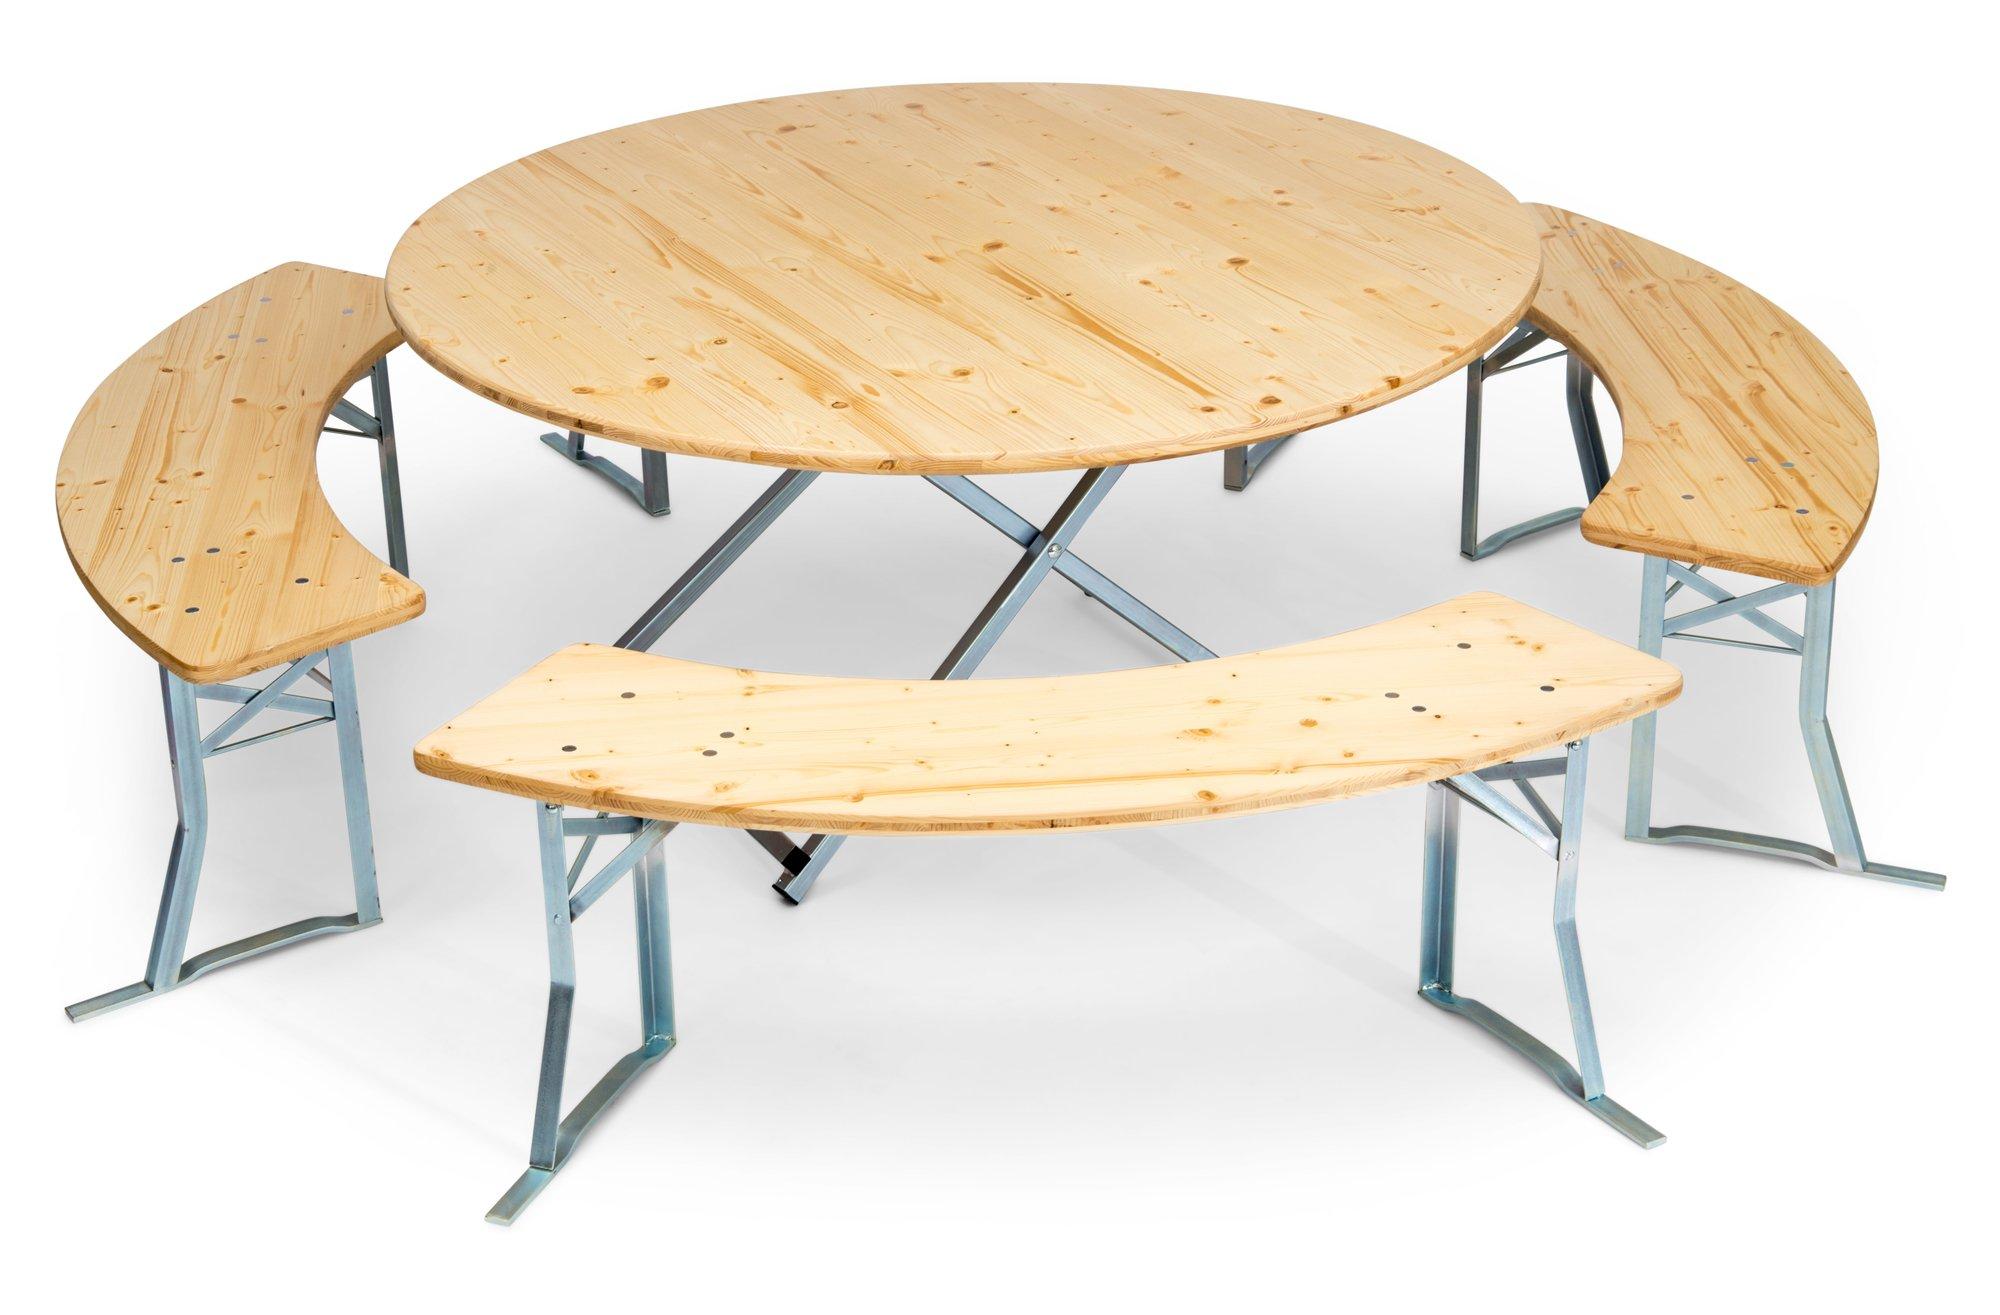 bierzeltgarnitur 80 cm breit wb23 kyushucon. Black Bedroom Furniture Sets. Home Design Ideas